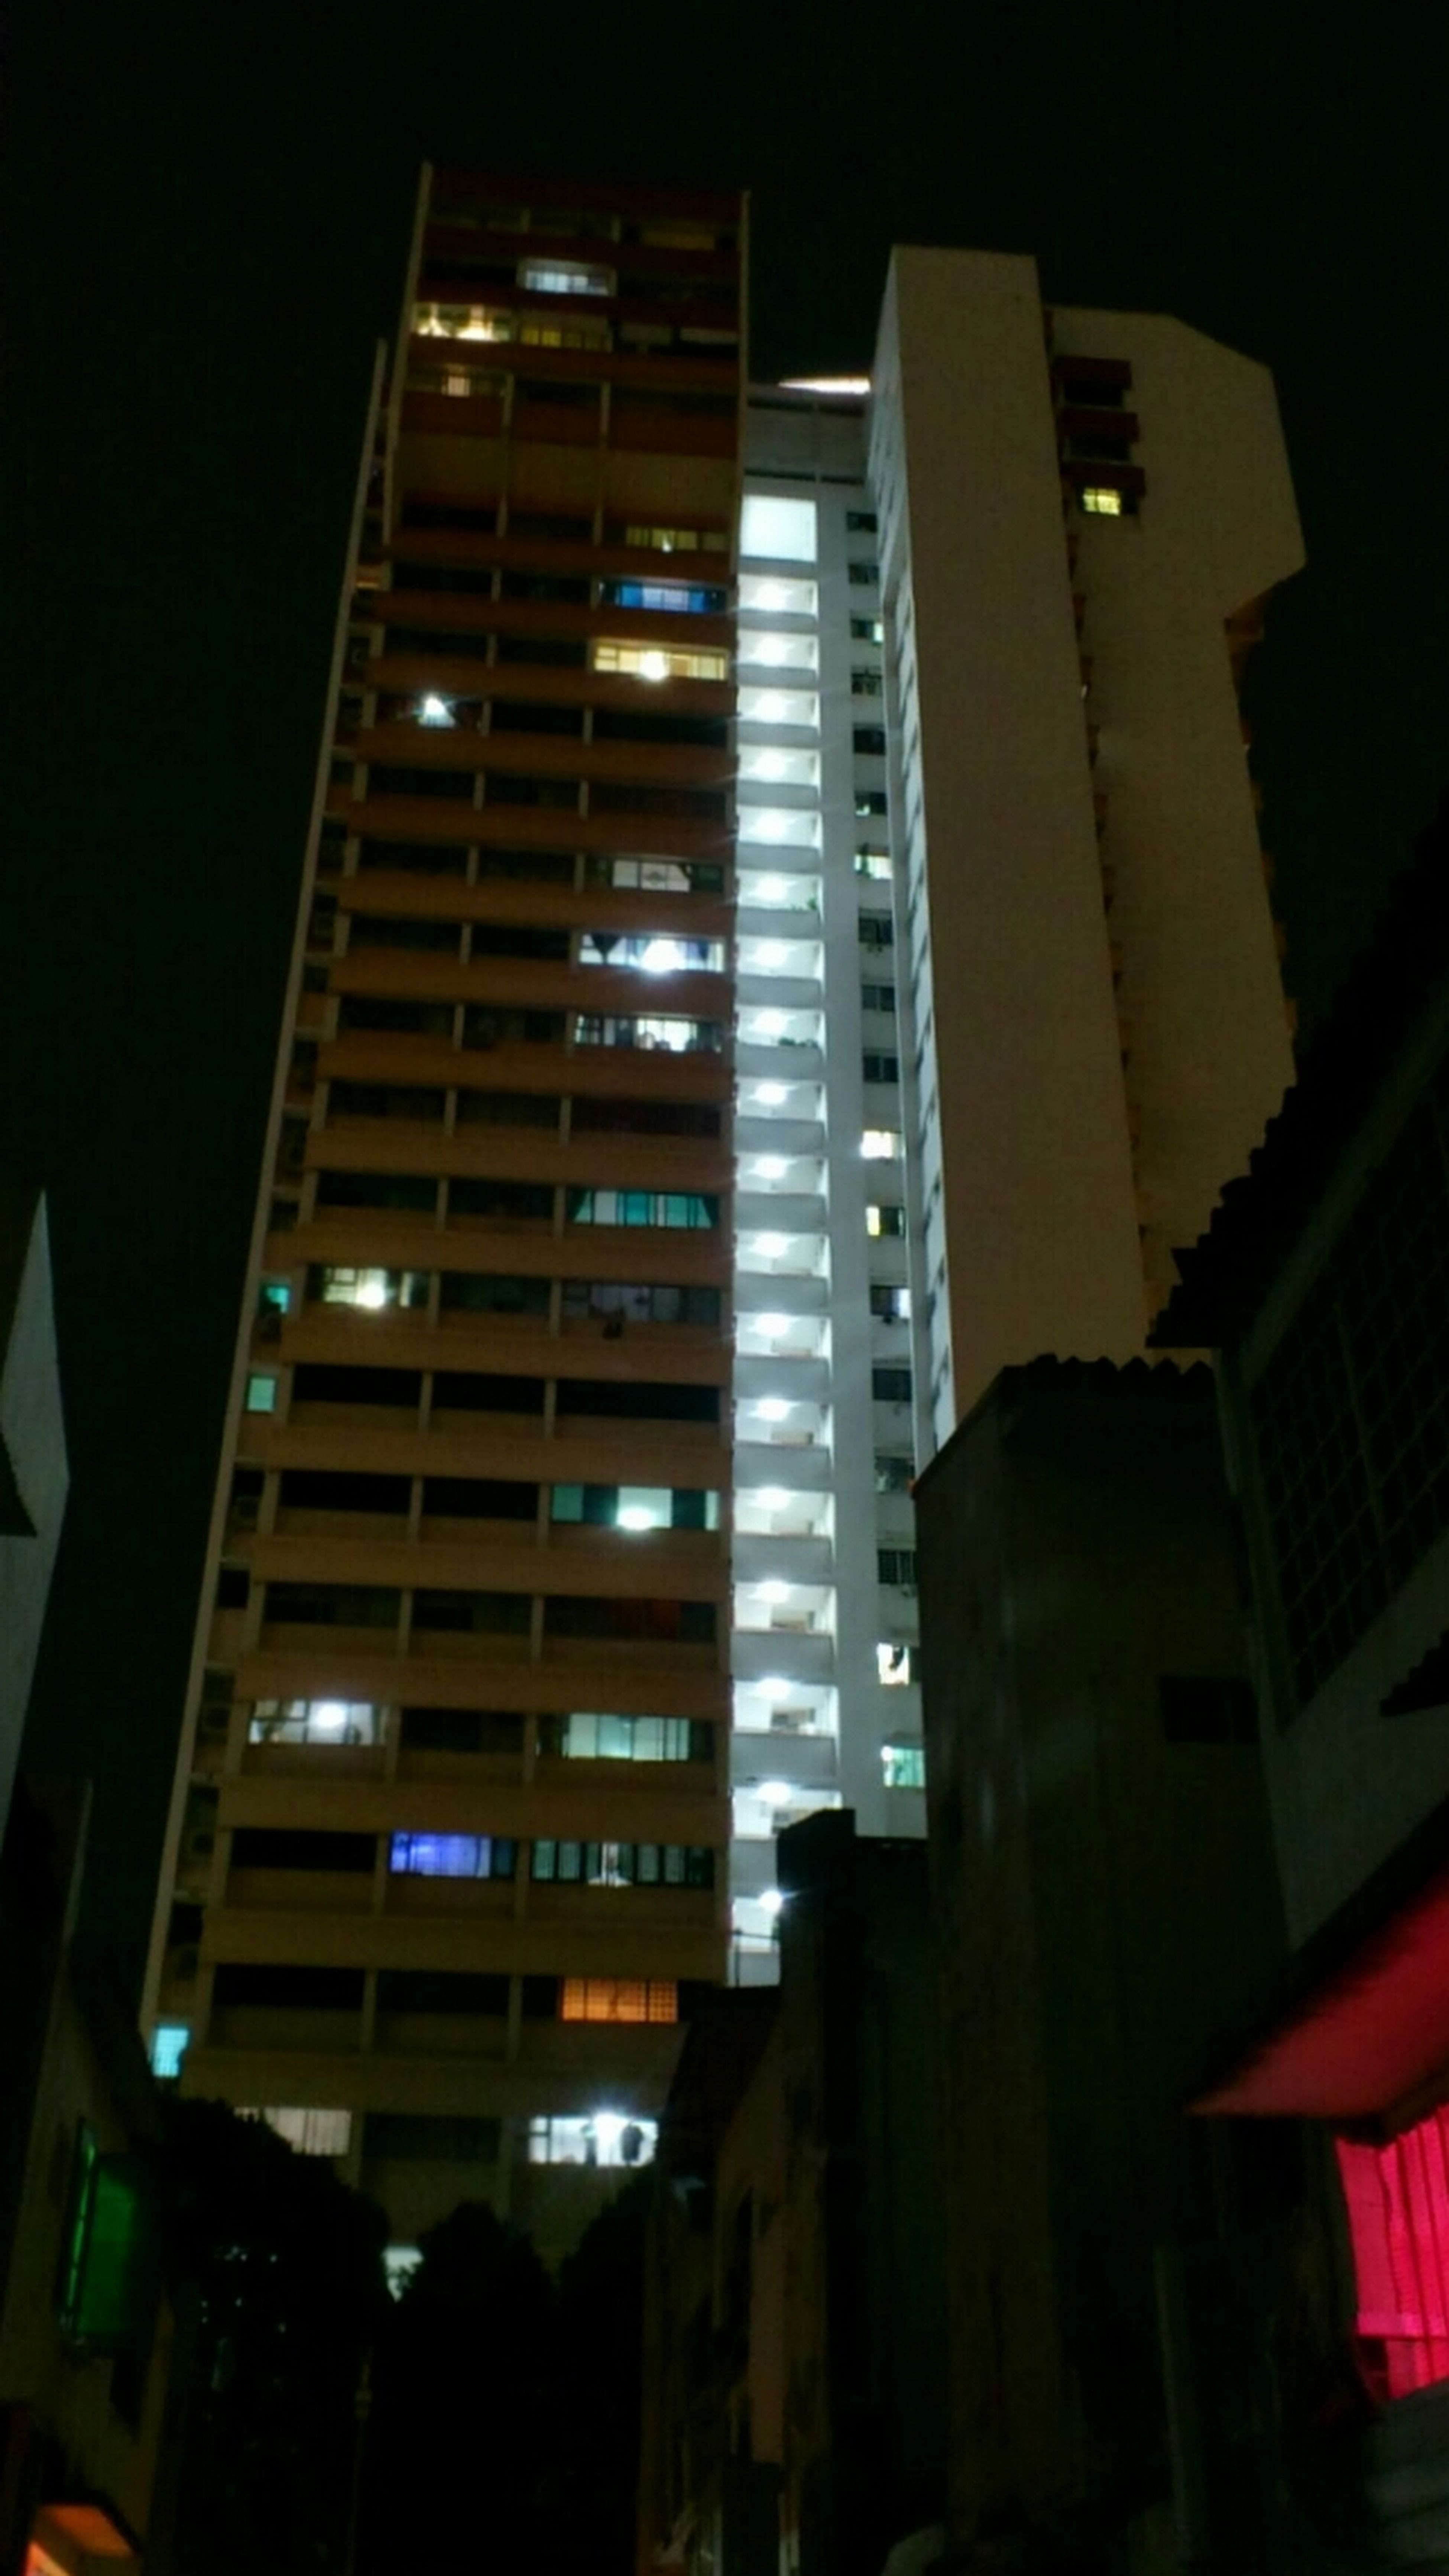 Singapore- Rowell Road SonyEricssonST18i Mobilephotography